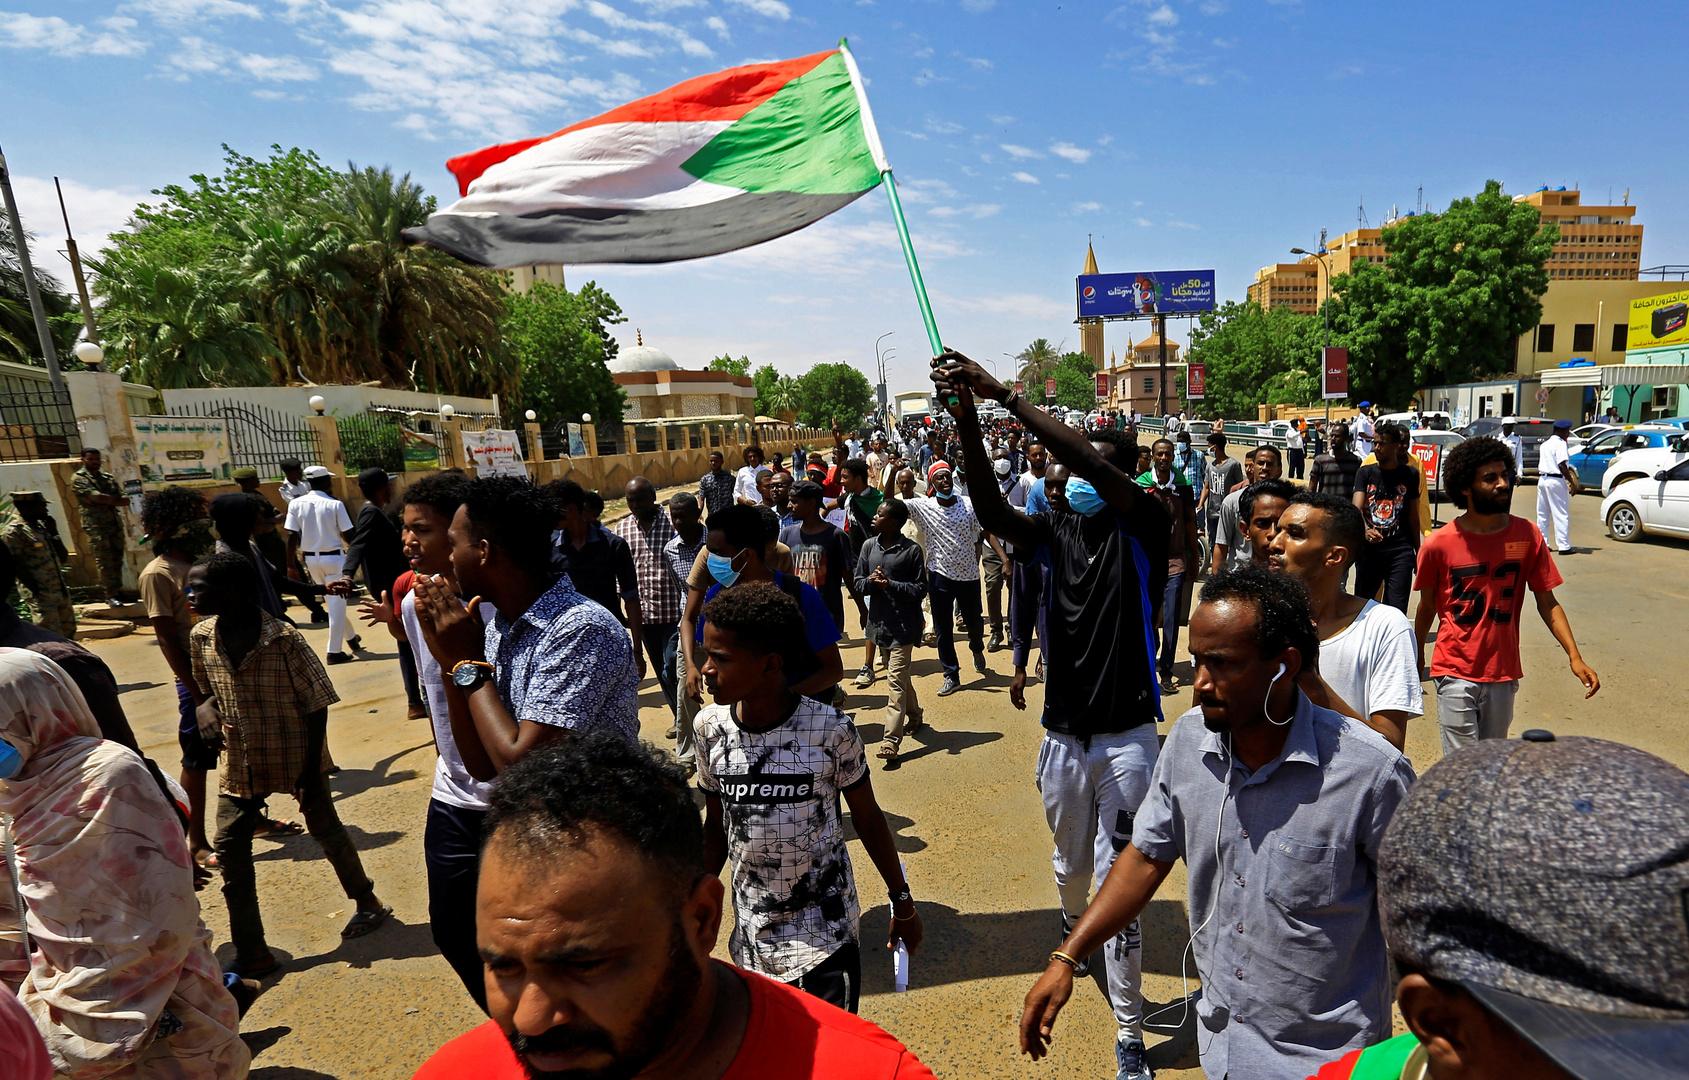 السودان يوقع اتفاقا مع